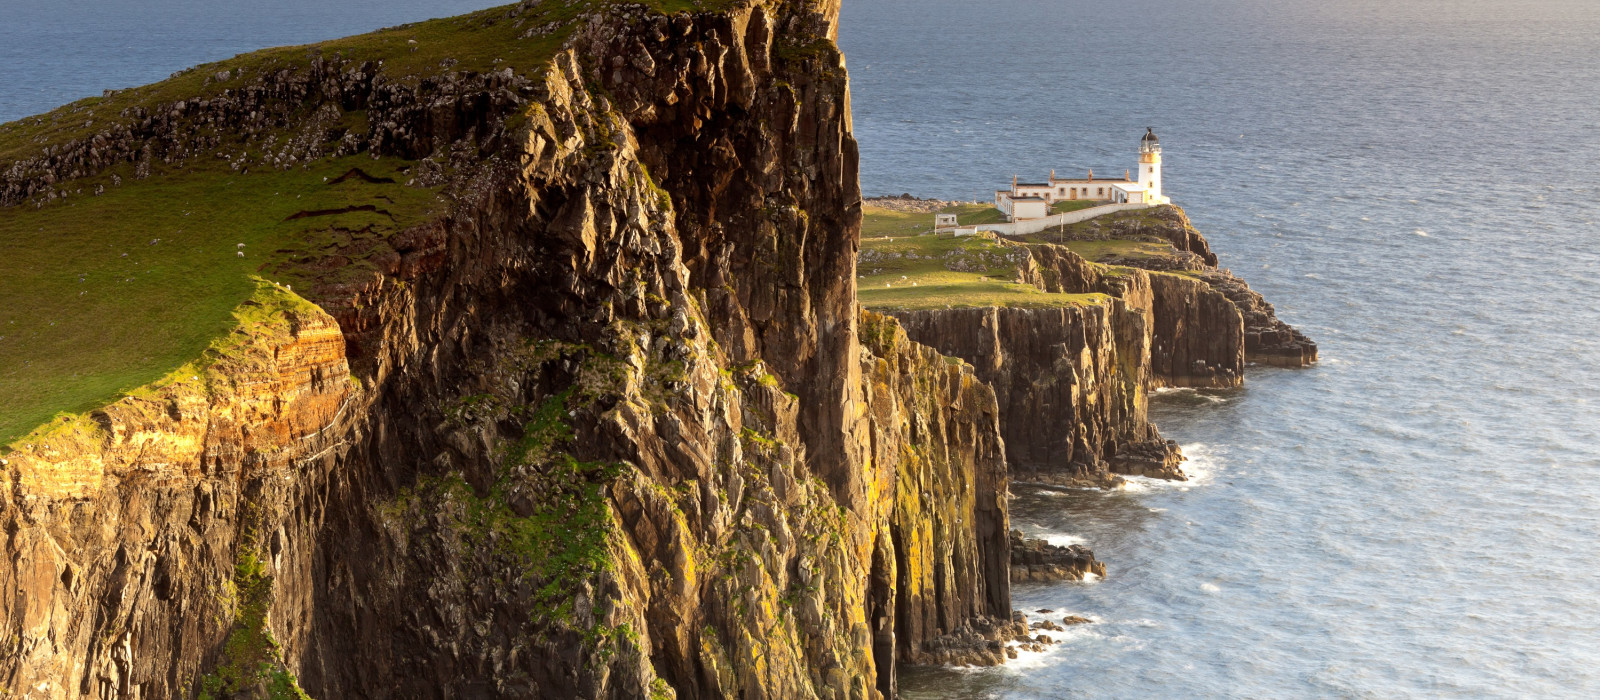 Destination Isle of Skye UK & Ireland